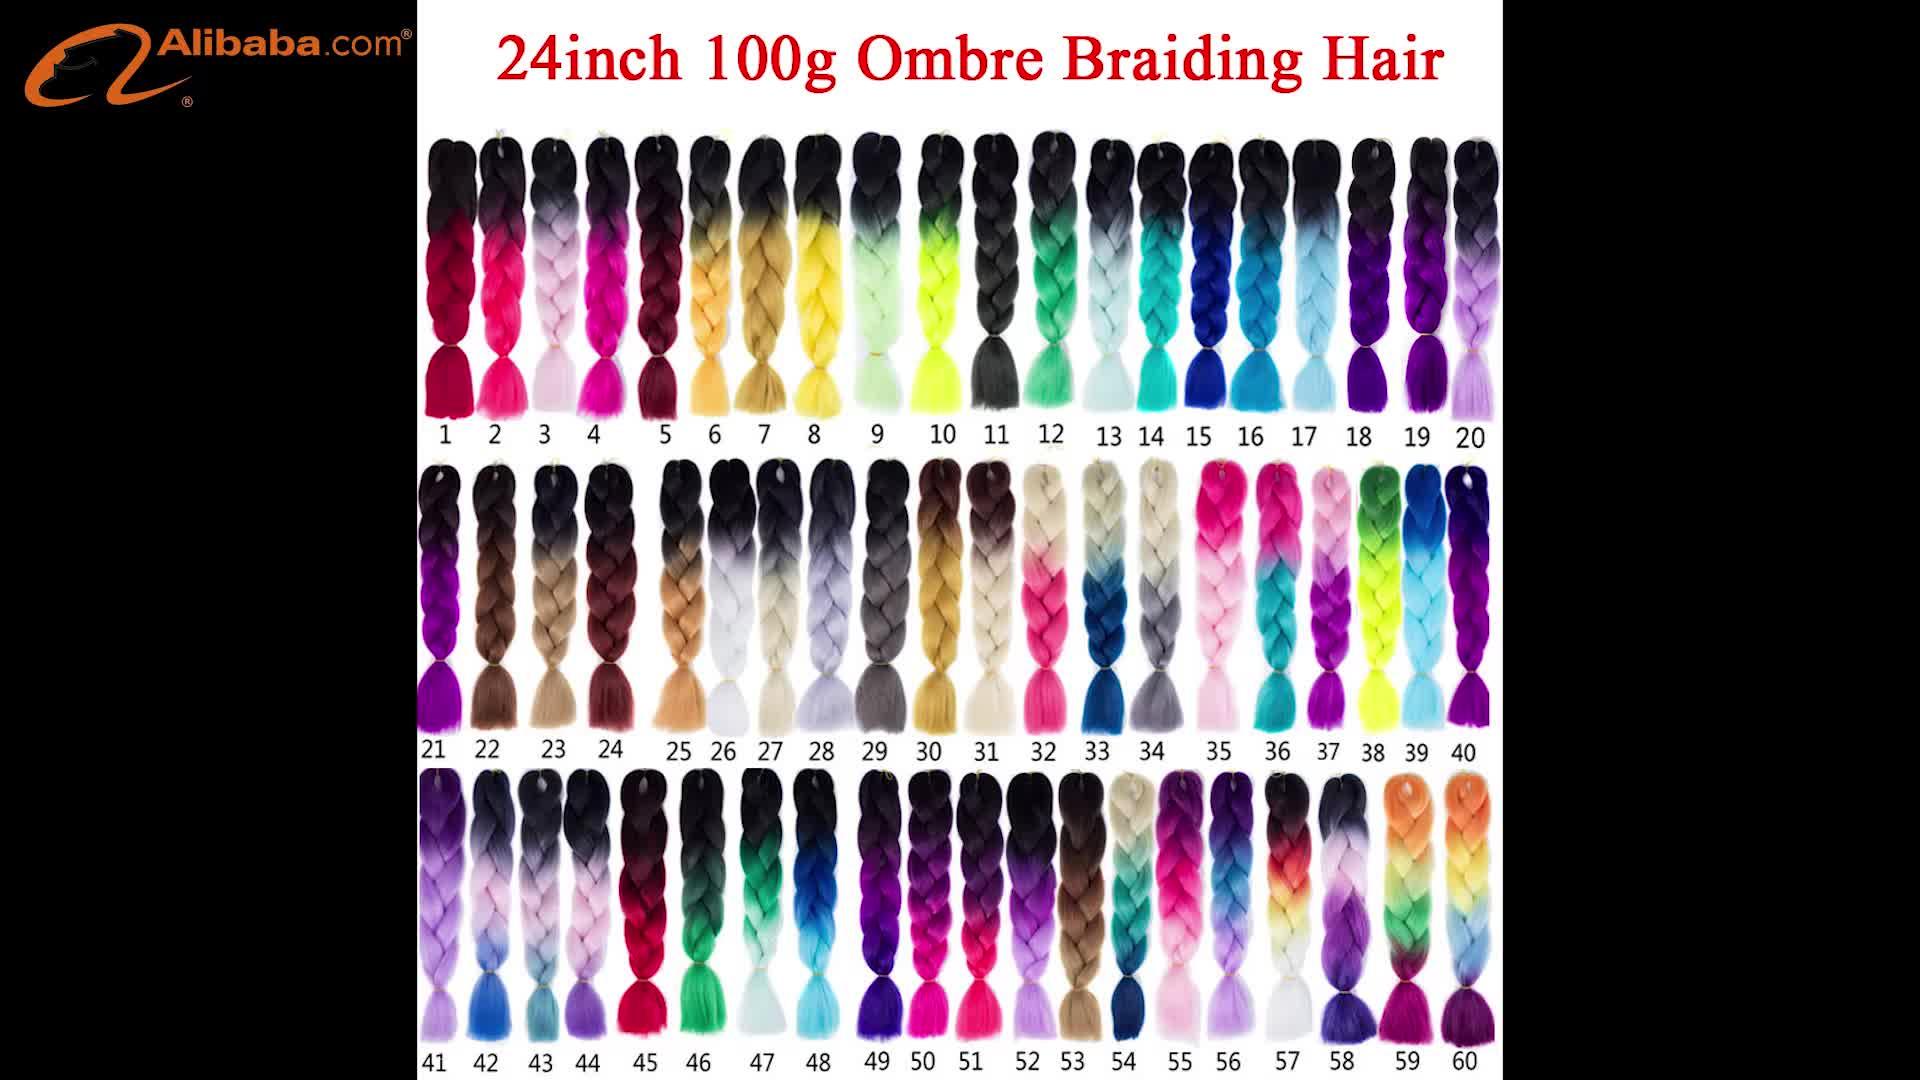 24 inch mixed farbe Private Label Synthetische groß Häkeln flechten haar für anbieter afrika haar flechten Groß